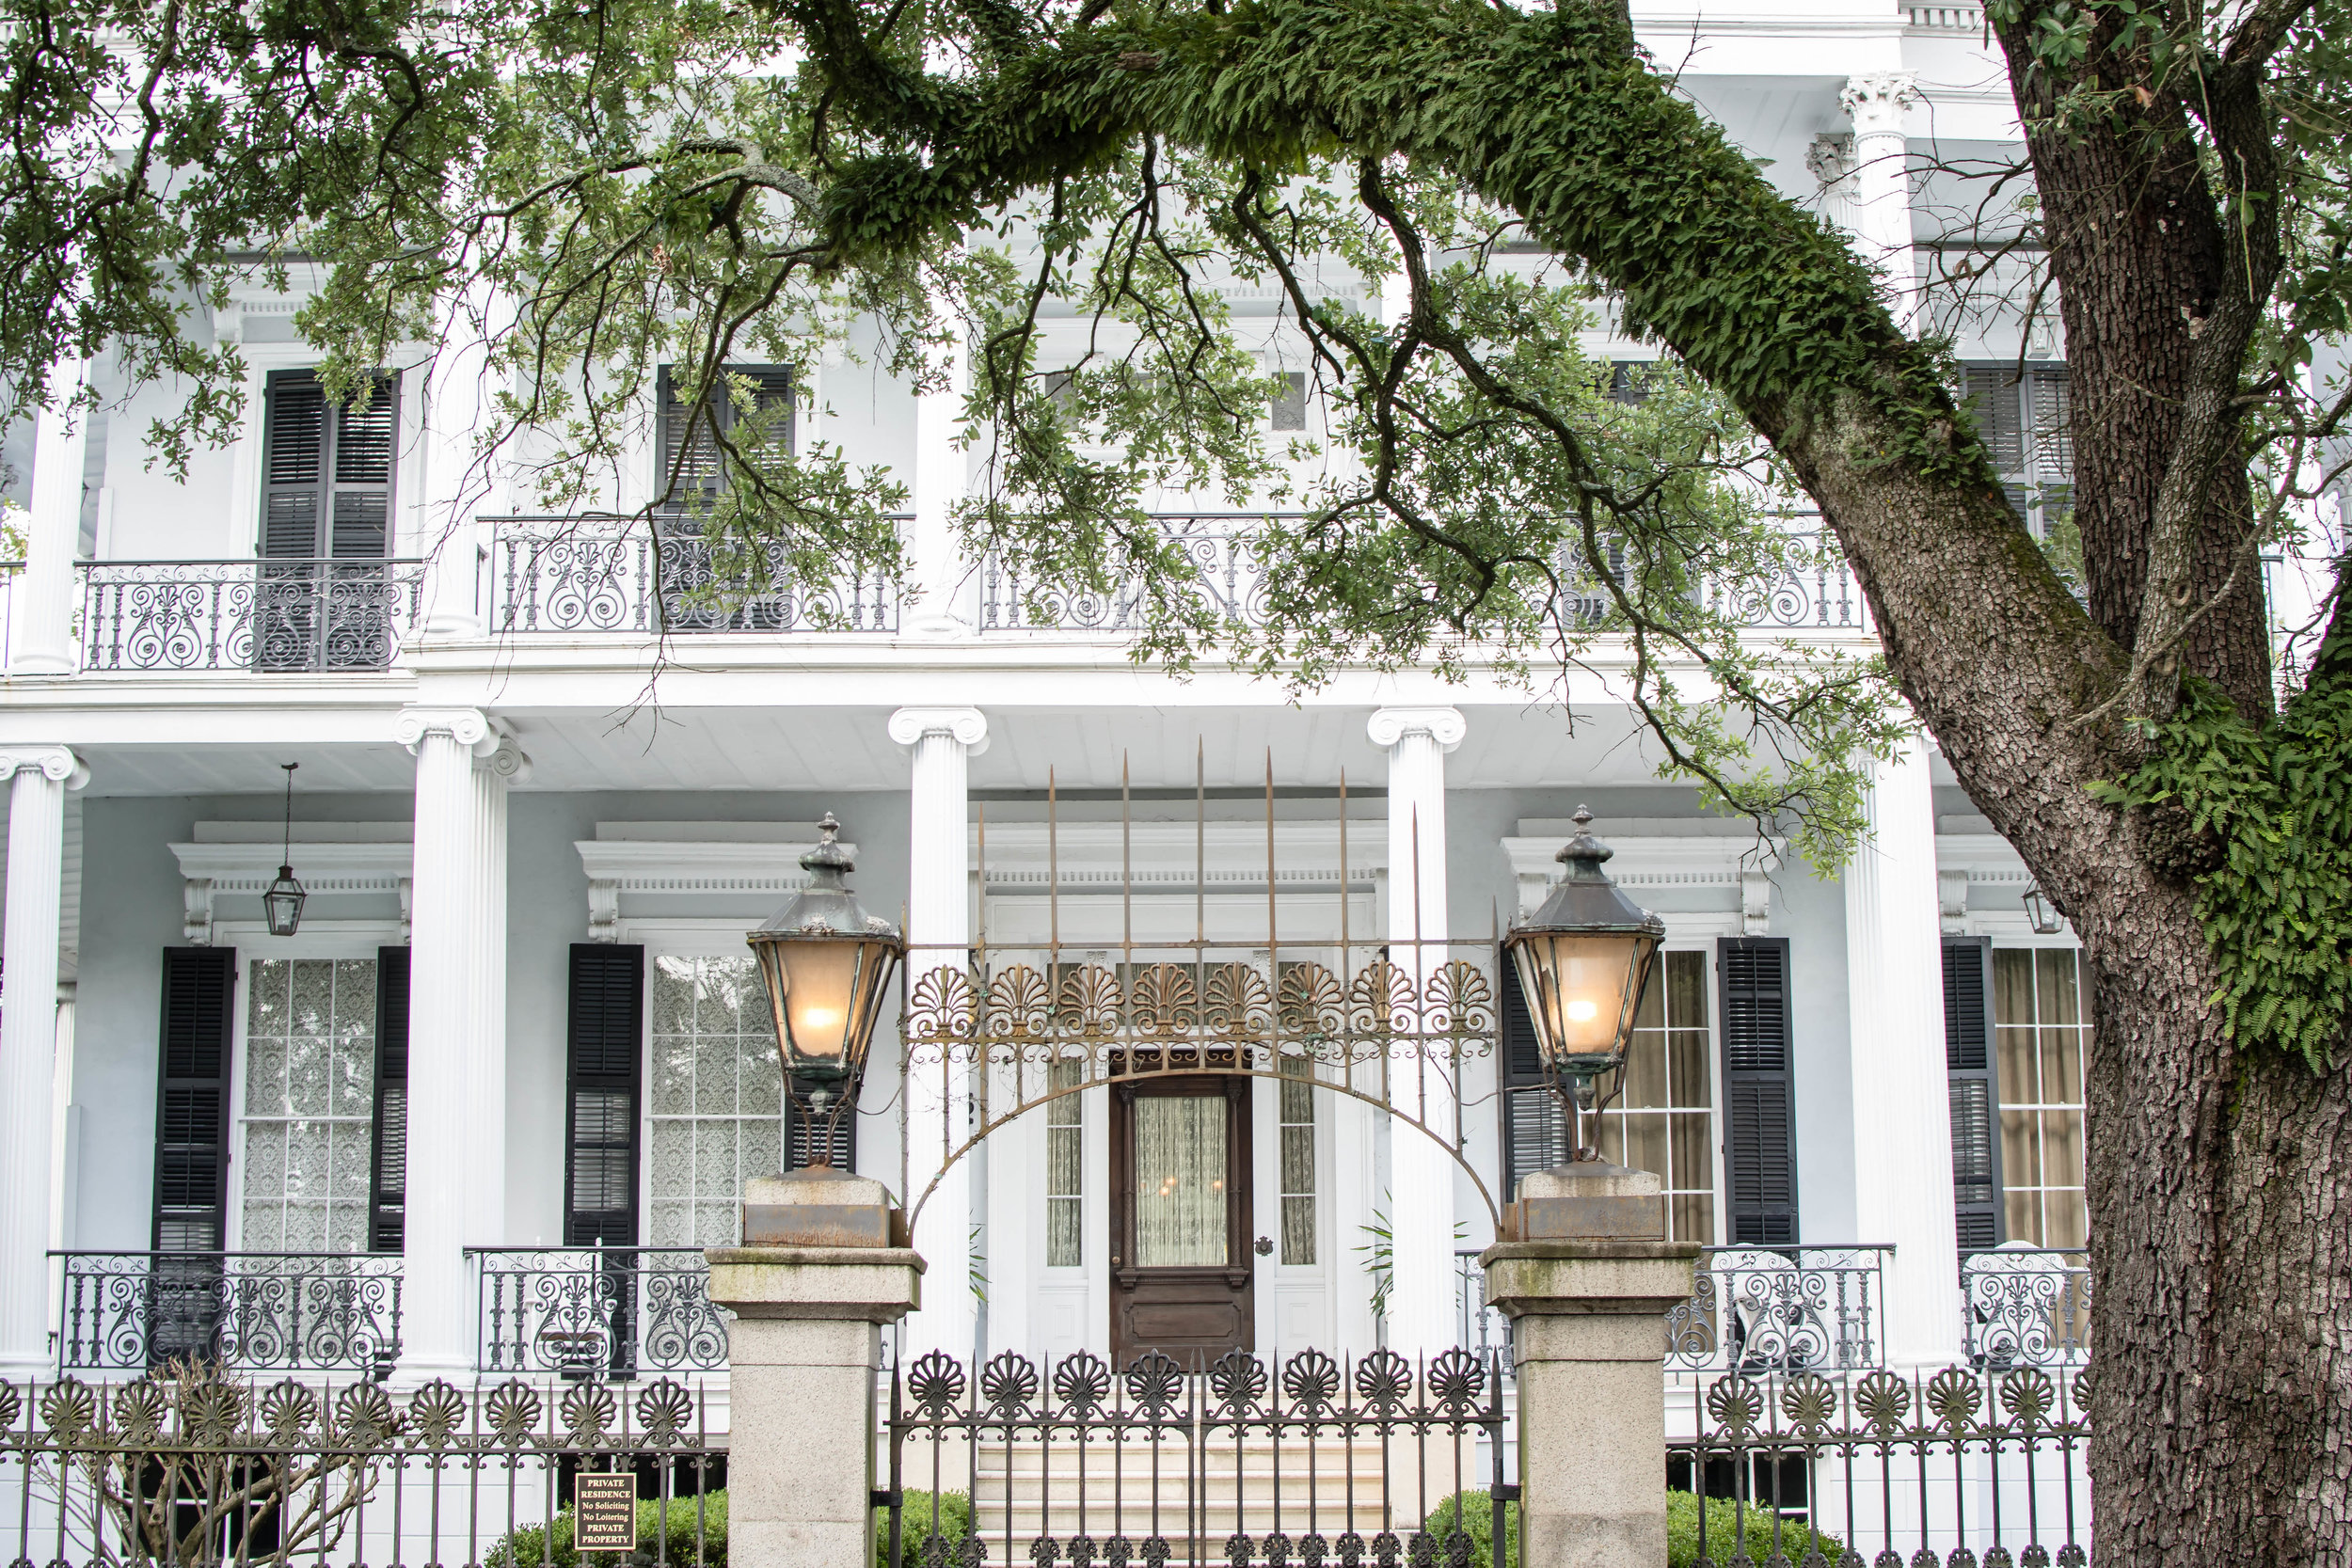 The impressively beautiful, Buckner Mansion.